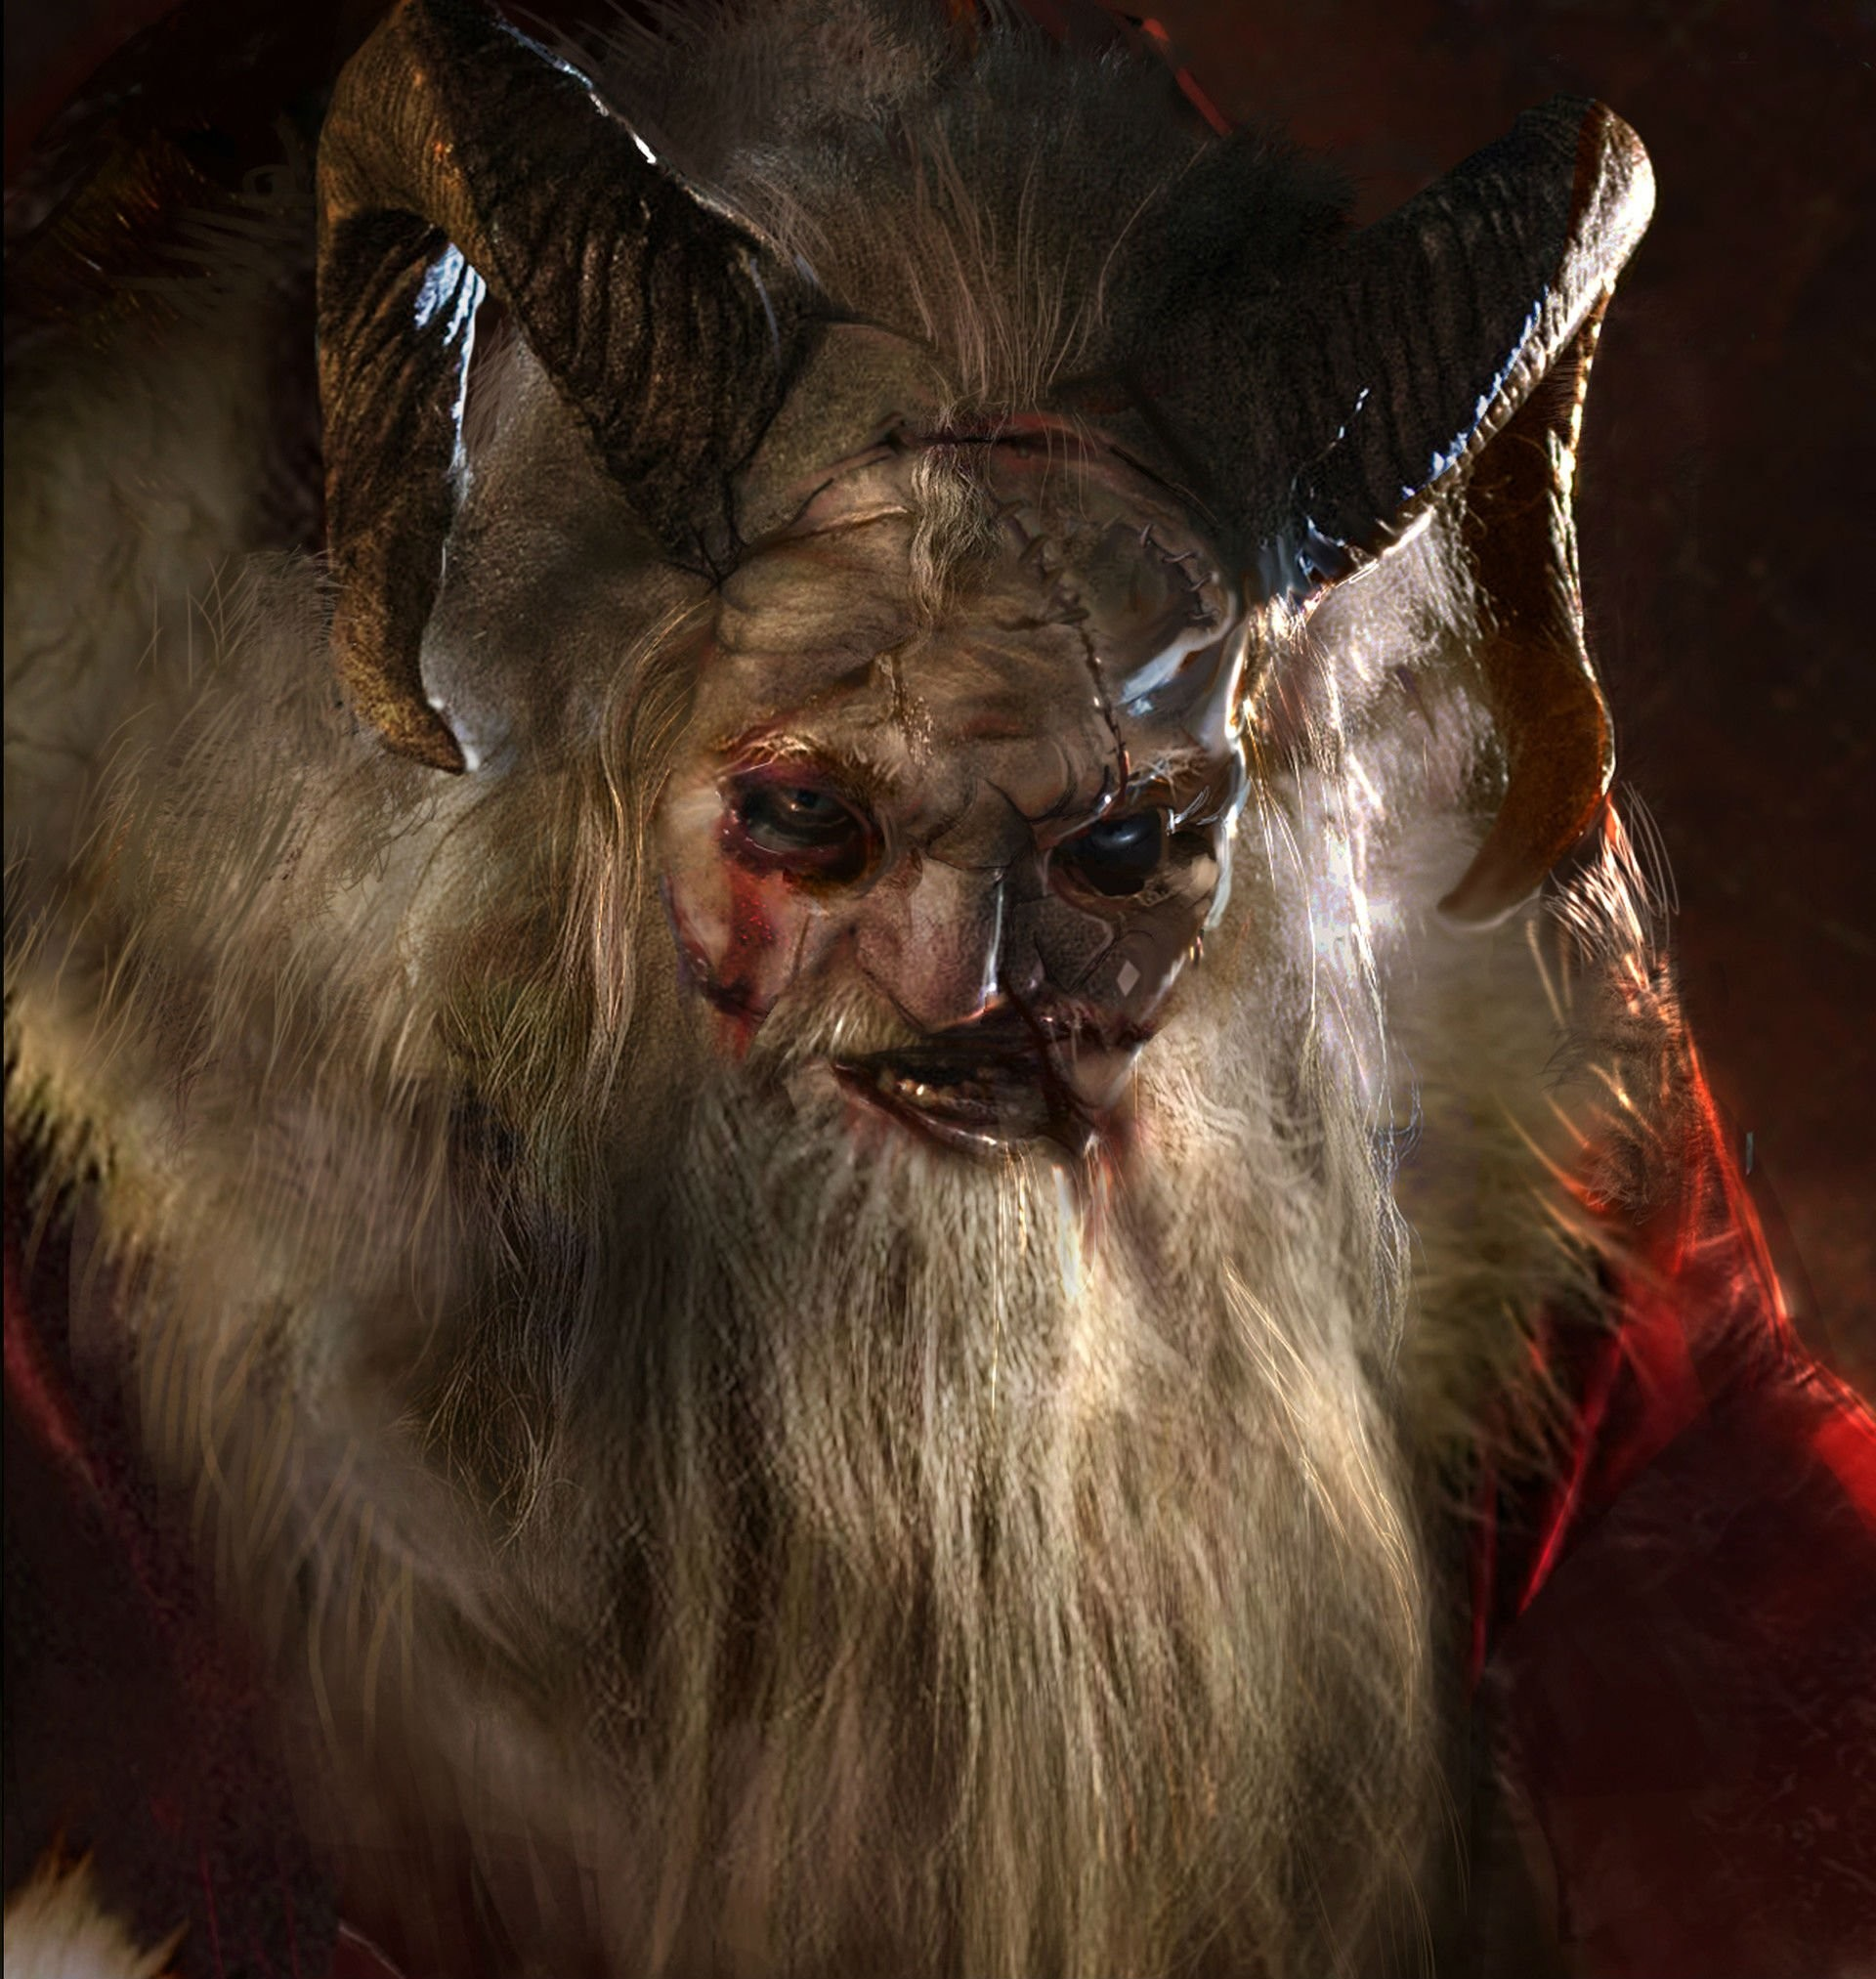 Res: 1920x2025, horror demon, occult, christmas, monster, dark, darknes wallpapers, windows  desktop images, hd vectors, evil, story,krampus, personal use,download  Wallpaper ...